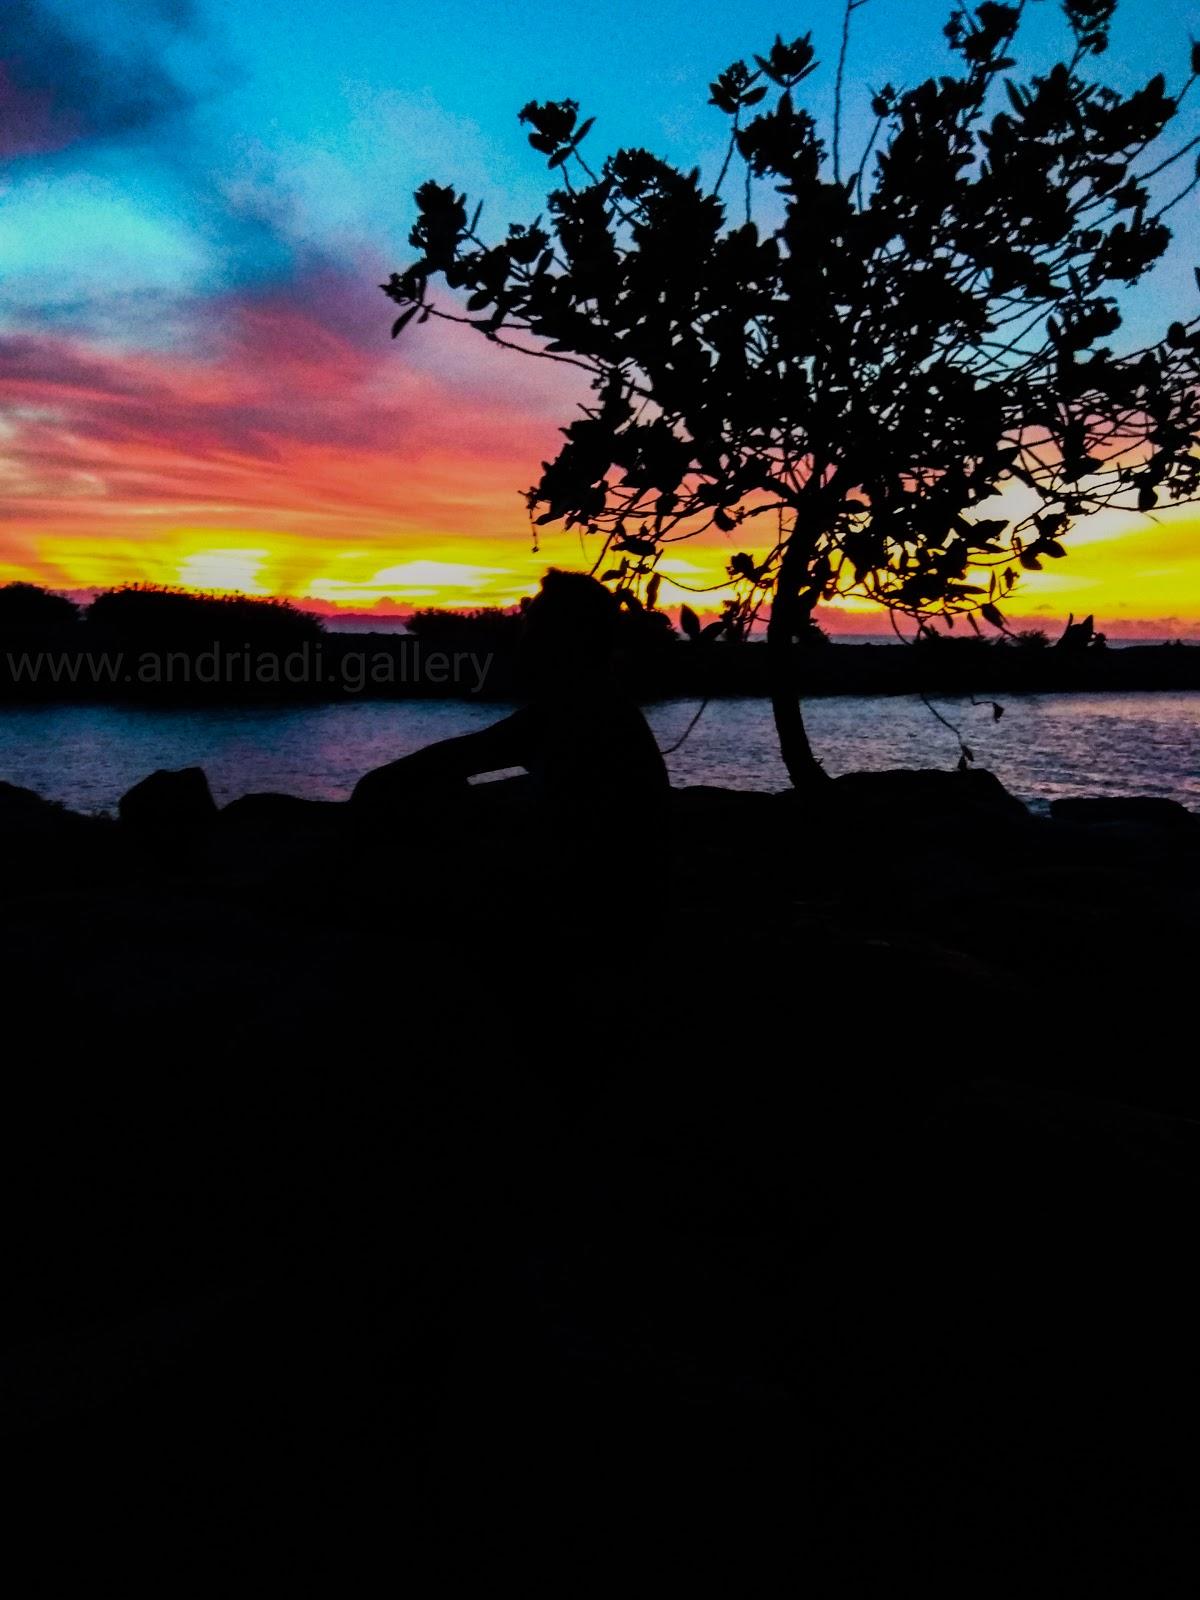 Santai Menikmati Sunset | Phone Wallpapers HD  Free Stock Photos